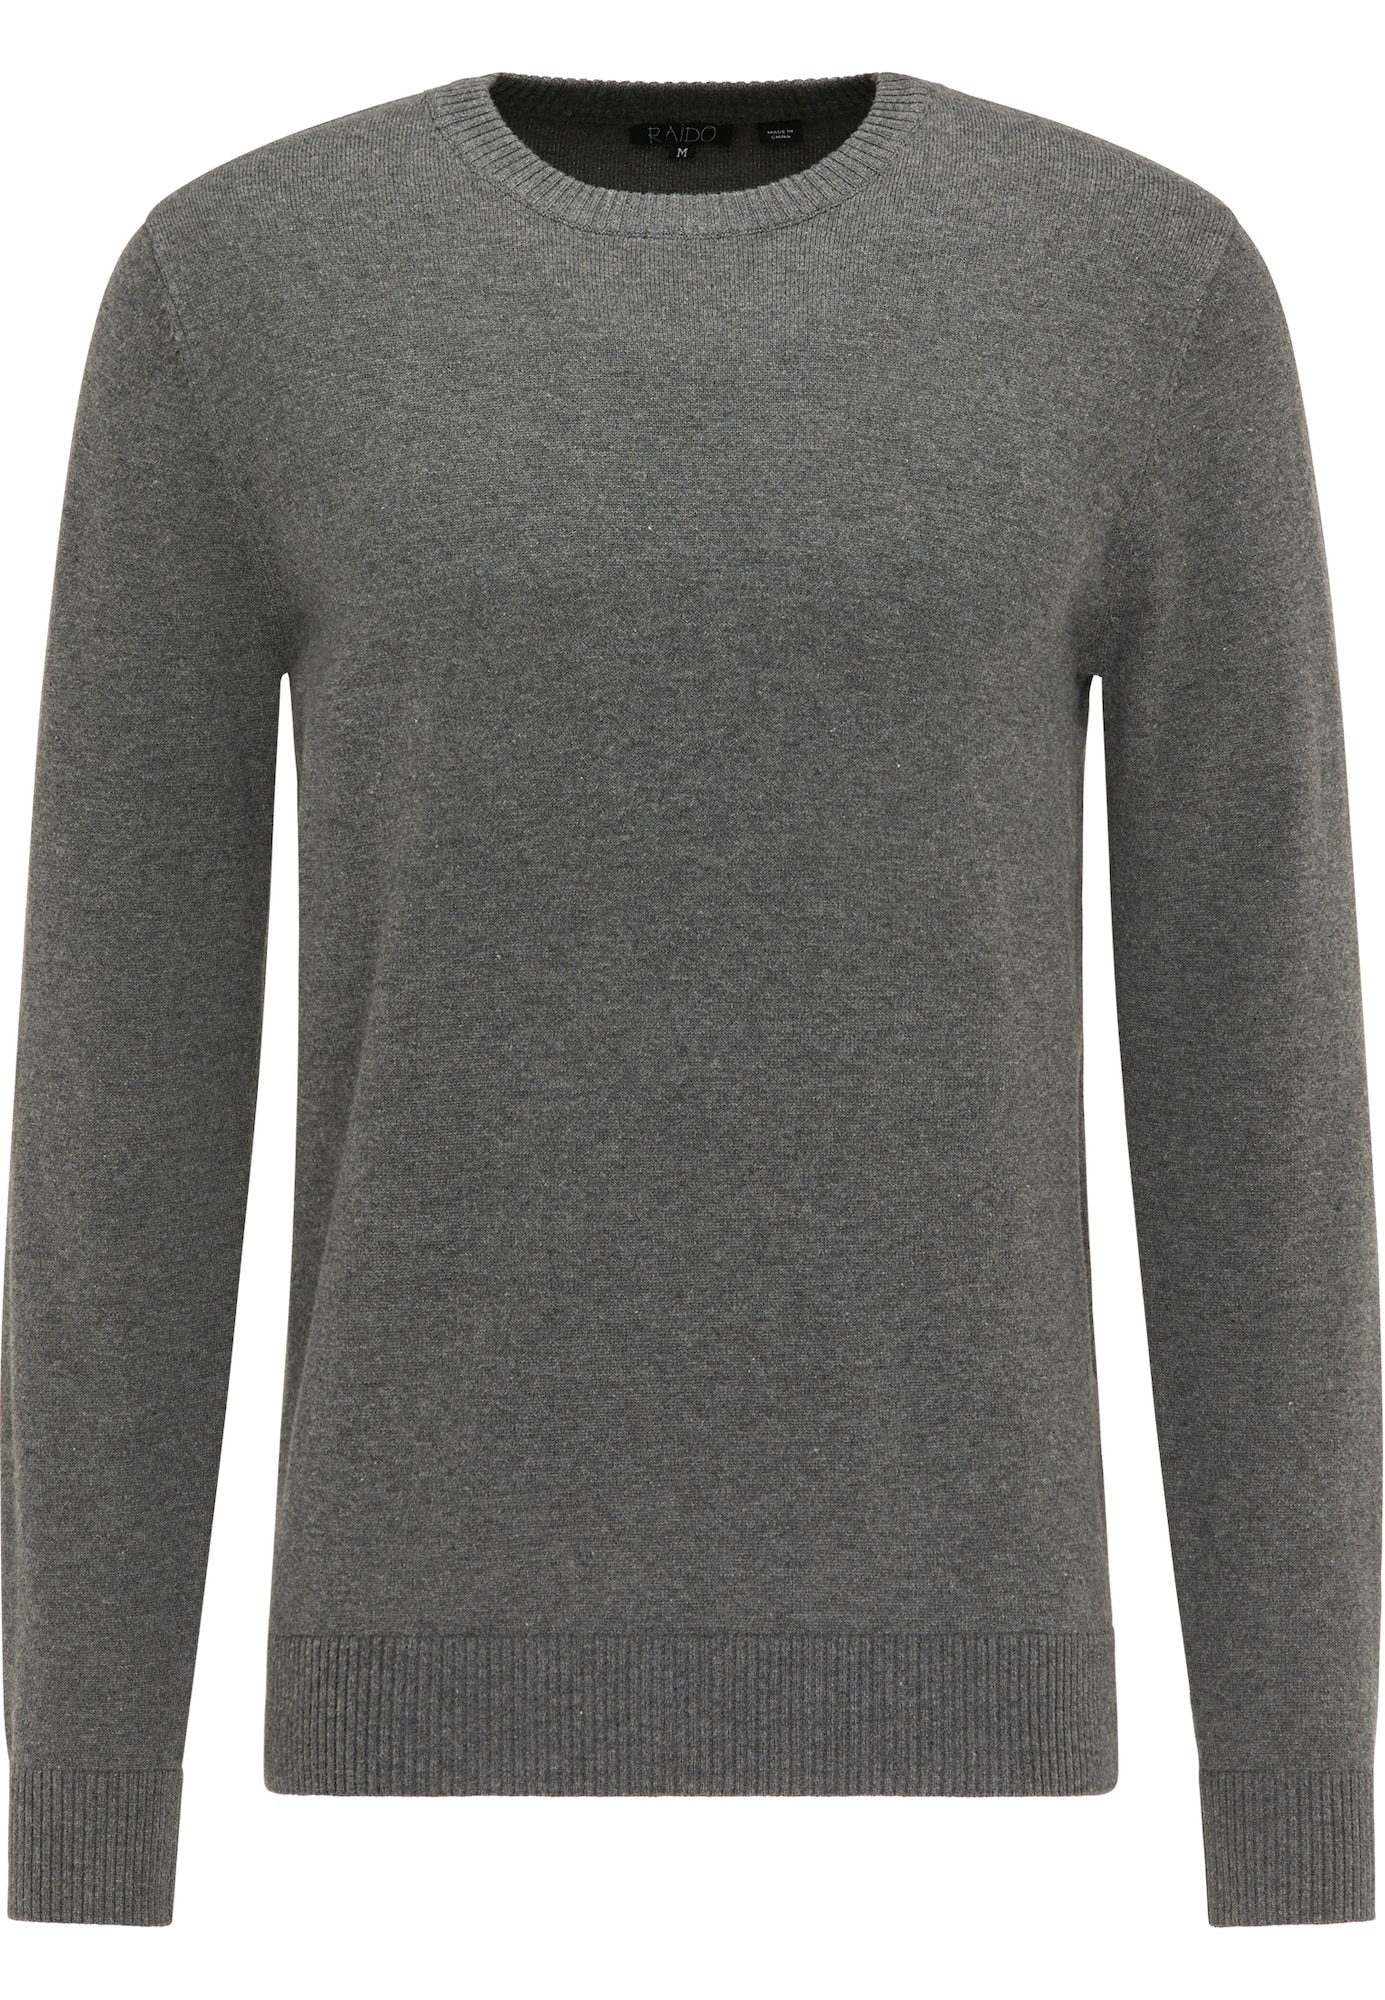 RAIDO Megztinis tamsiai pilka